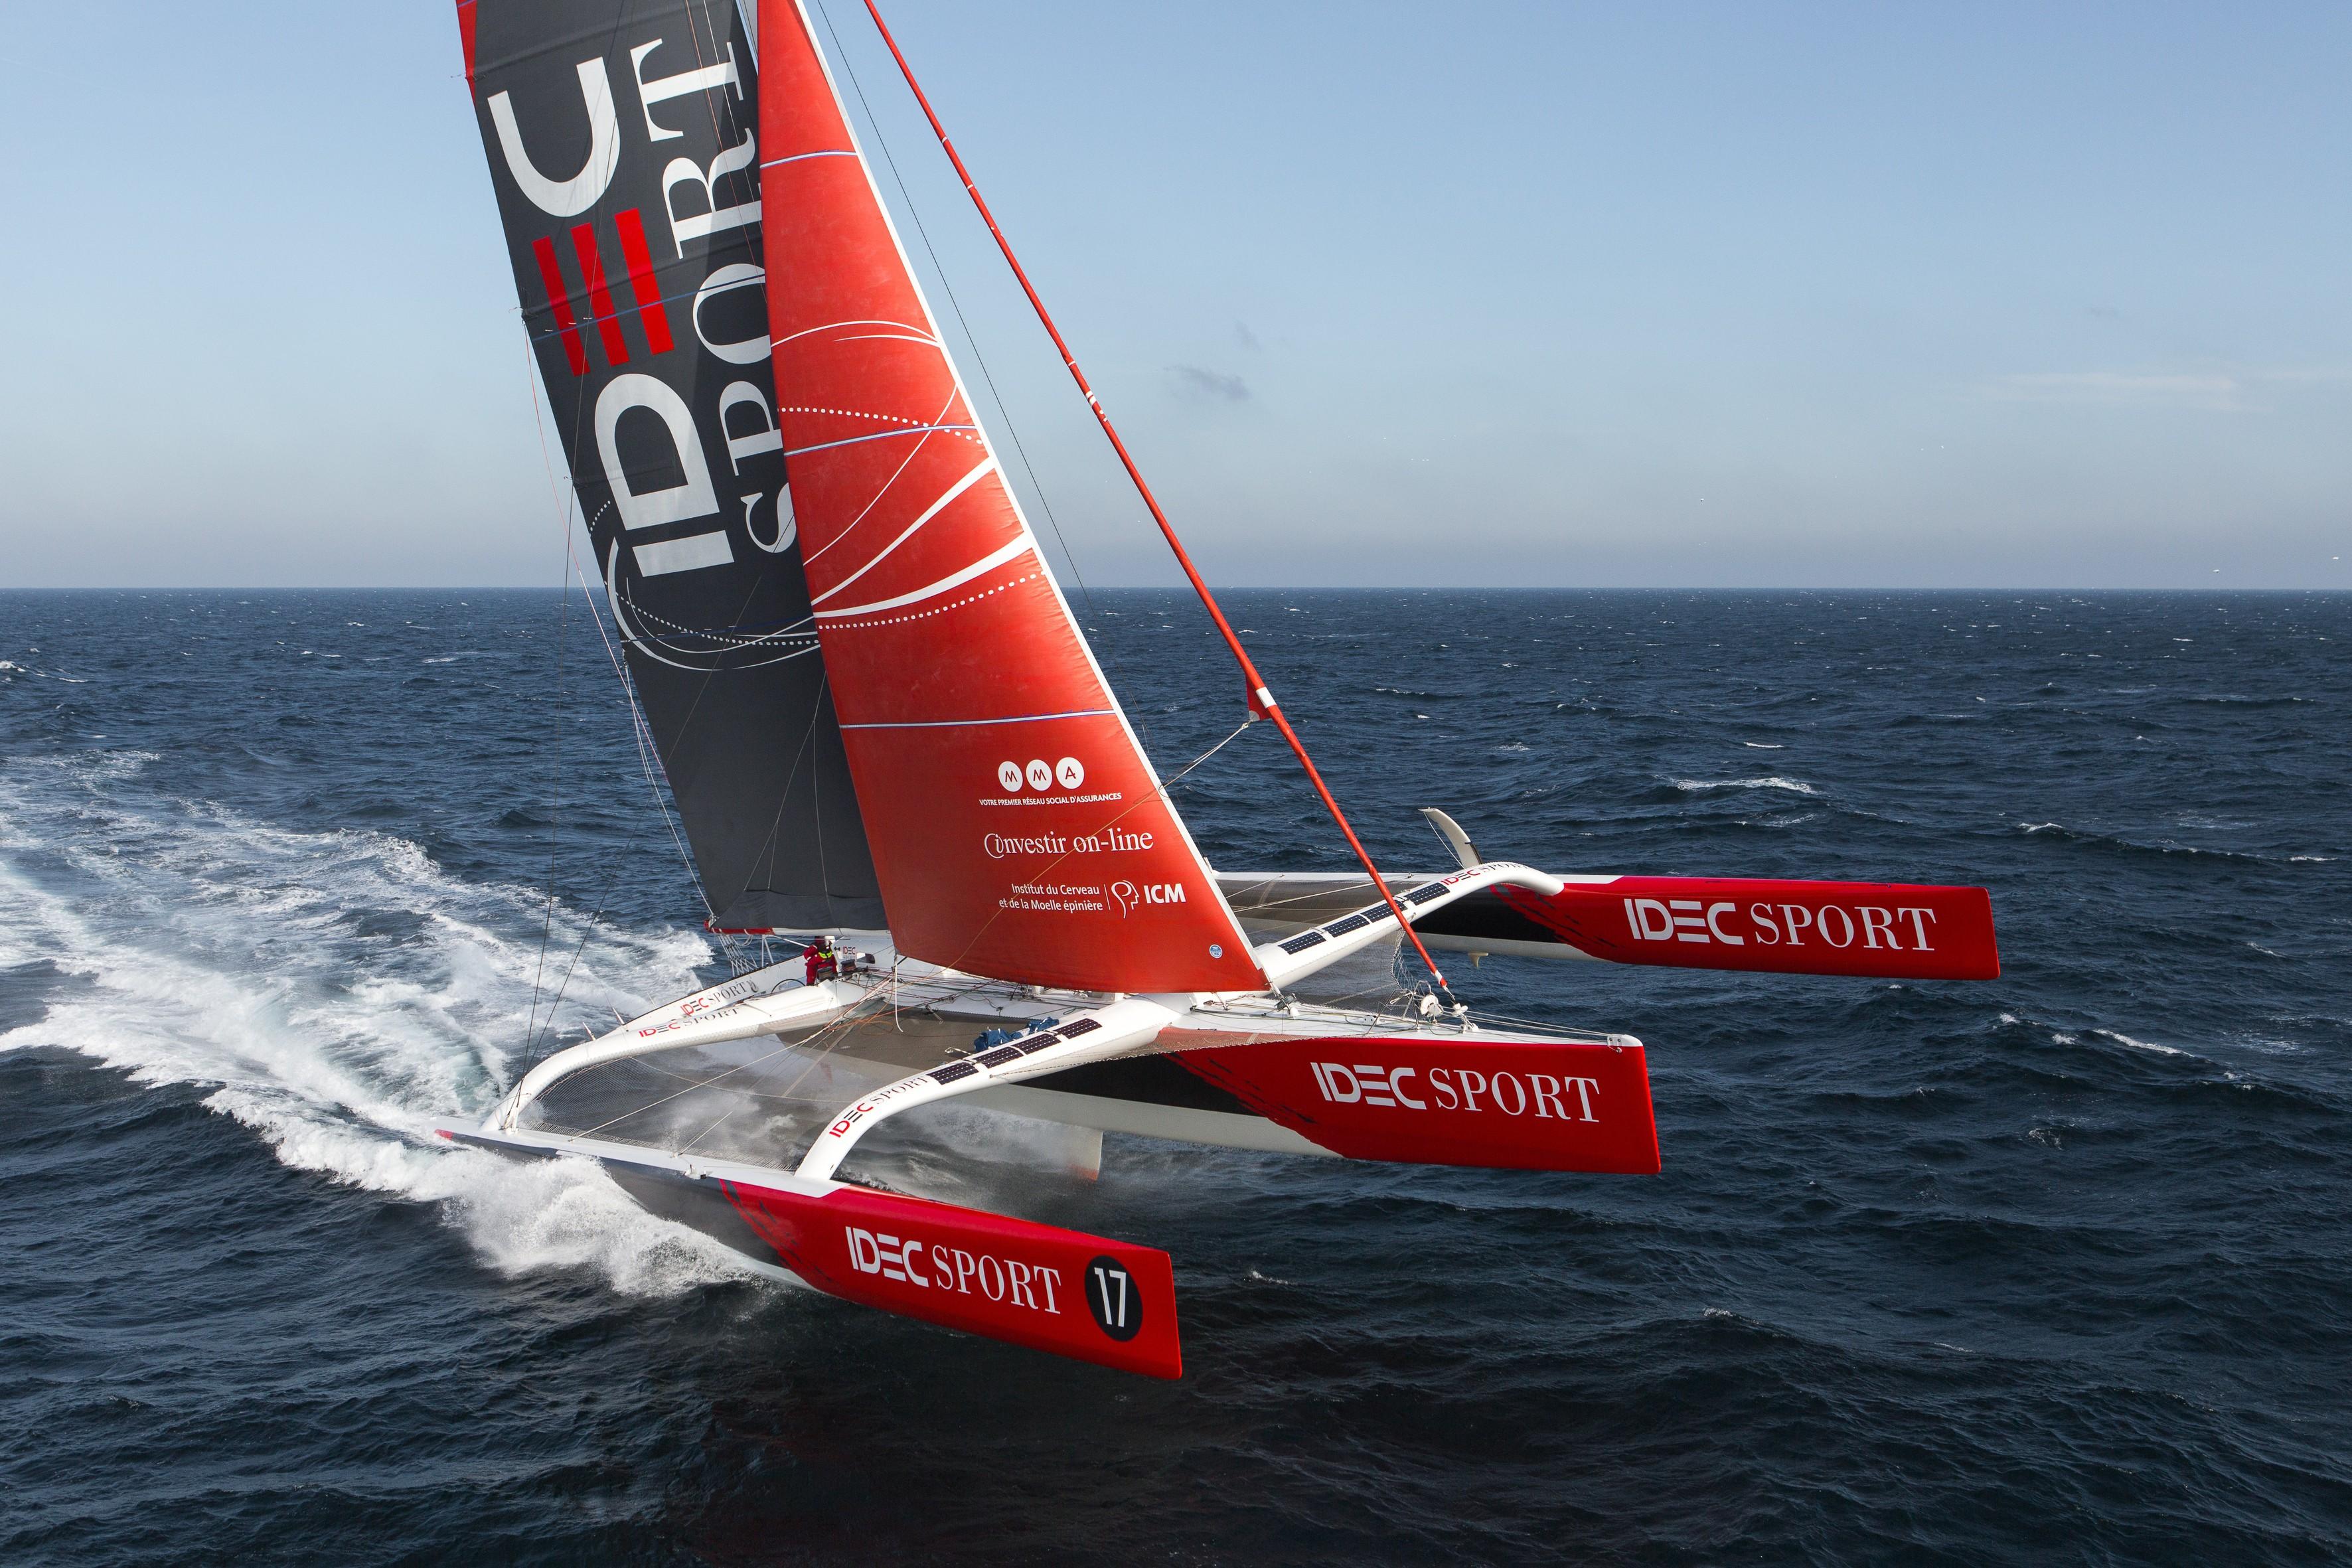 IDEC Sport - Sailing